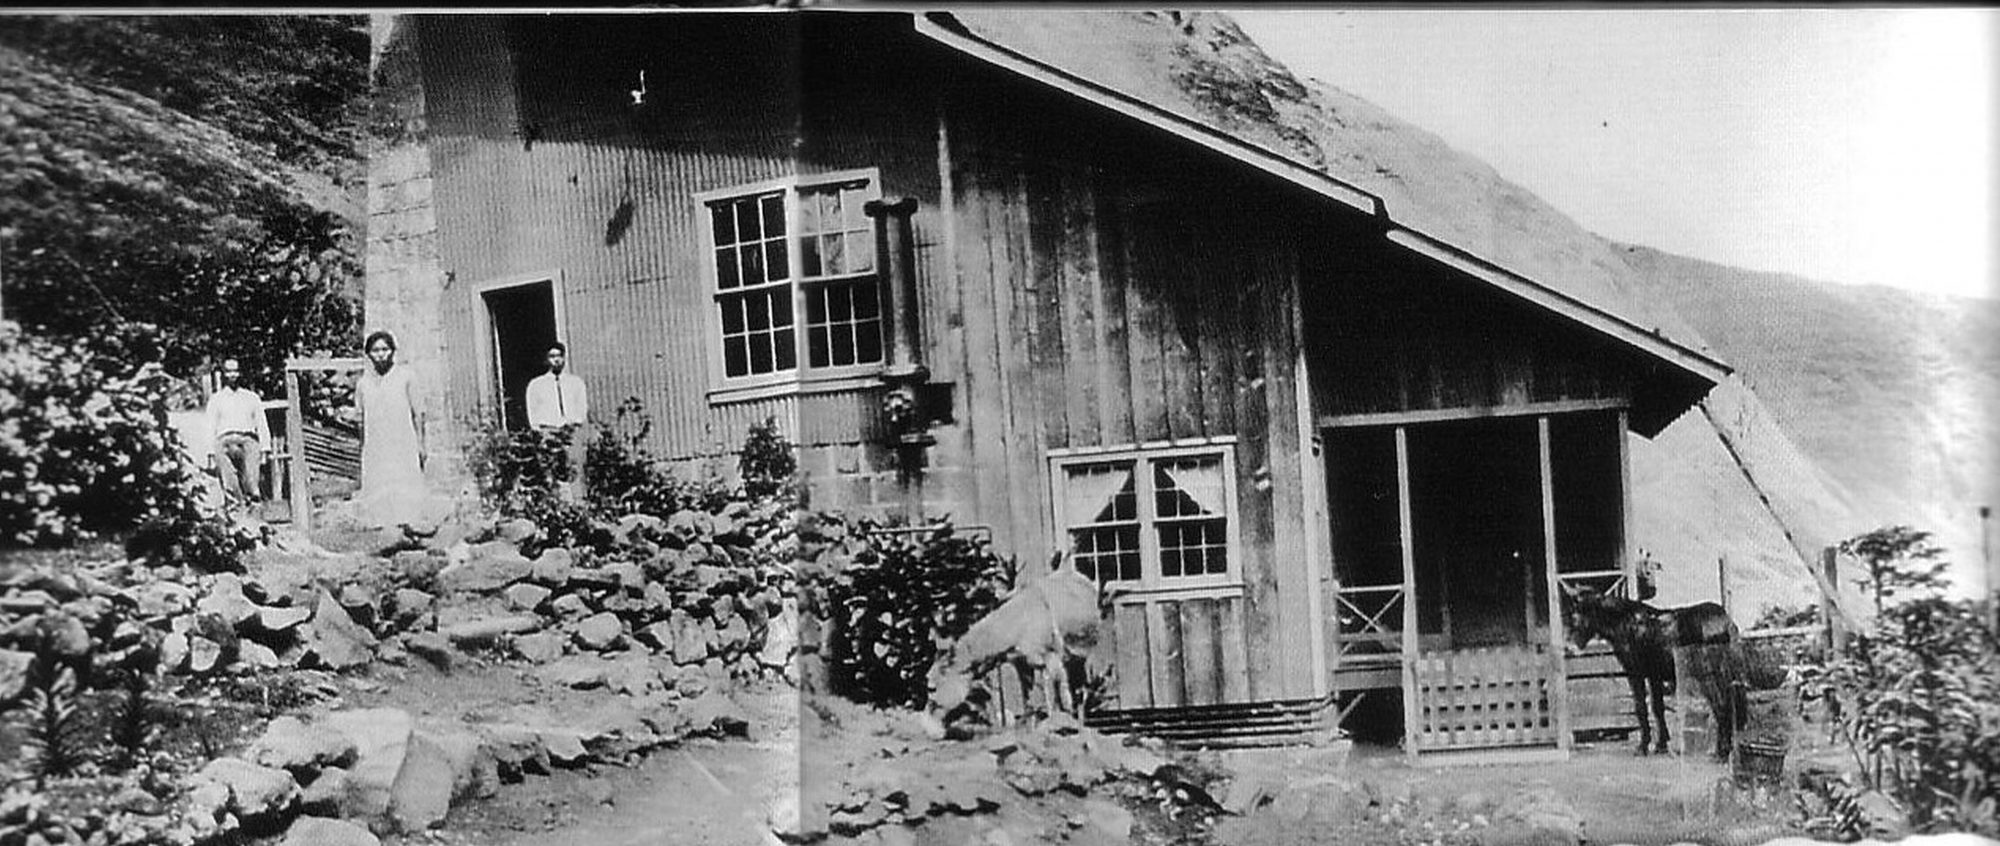 B_Nakafuji-Itakura_Coll_ MaunaleiPumphouse_ca_1925